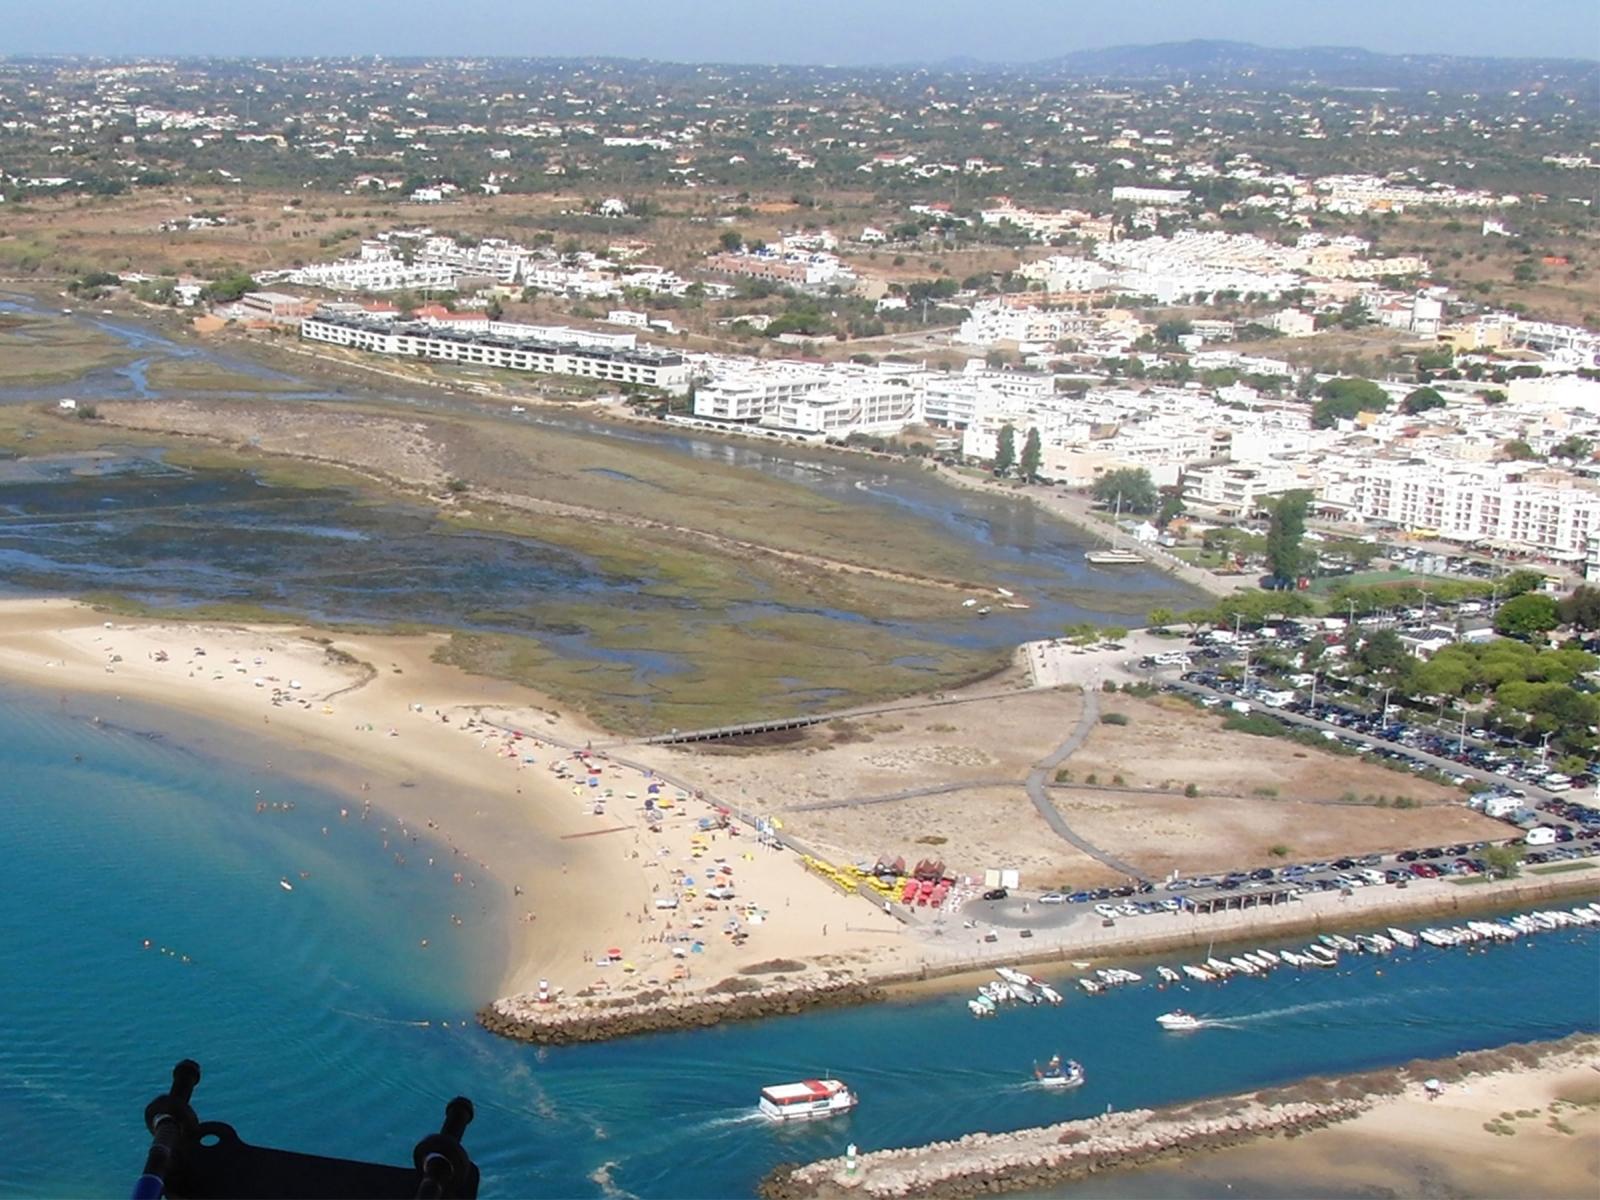 Praia da Fuseta Ria Algarve Portal : Fuseta07 from praia-da-fuseta-ria.en.algarve-portal.com size 1600 x 1200 jpeg 1275kB